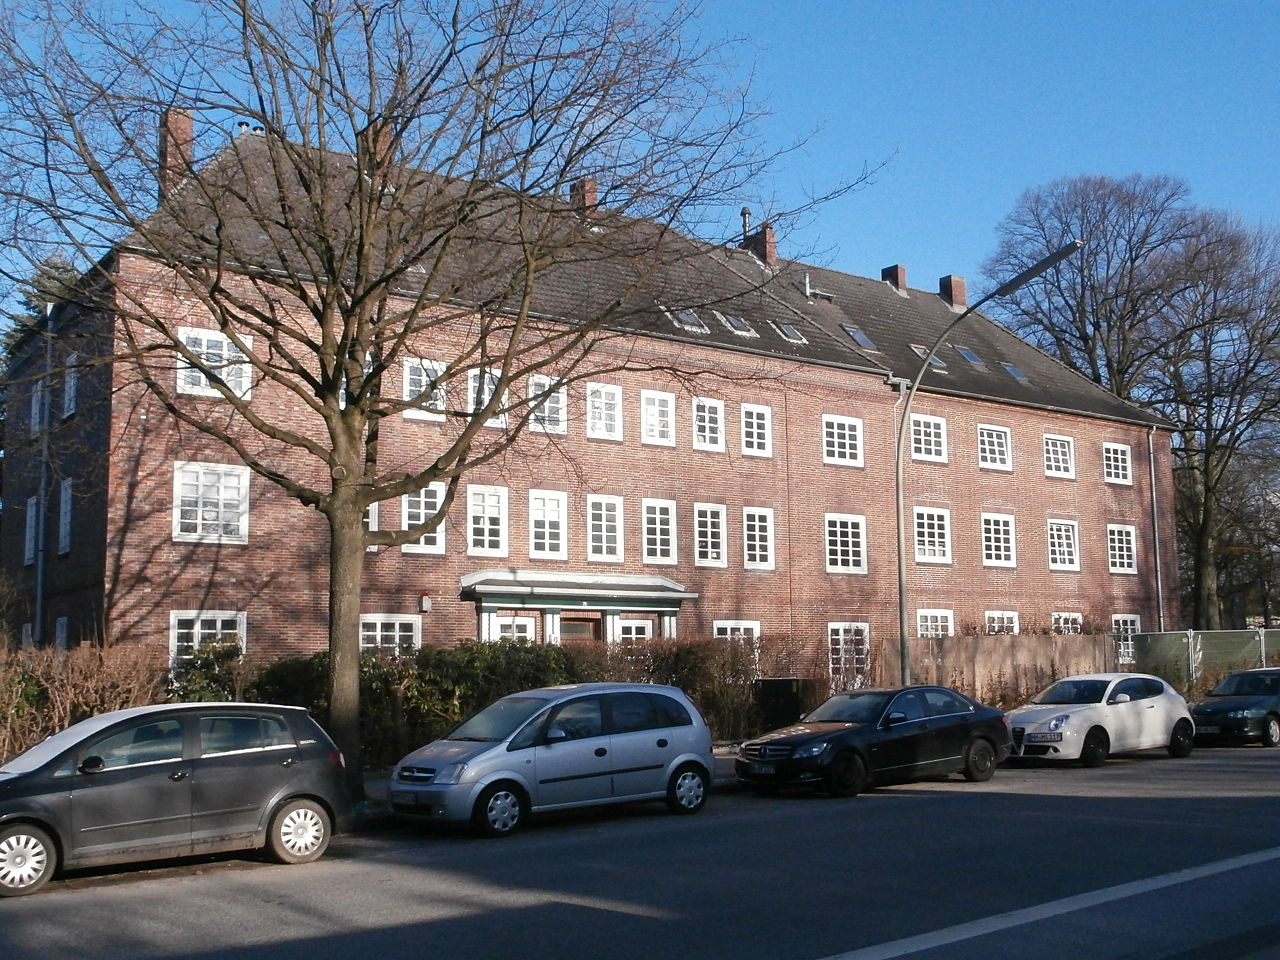 Bernadottestraße